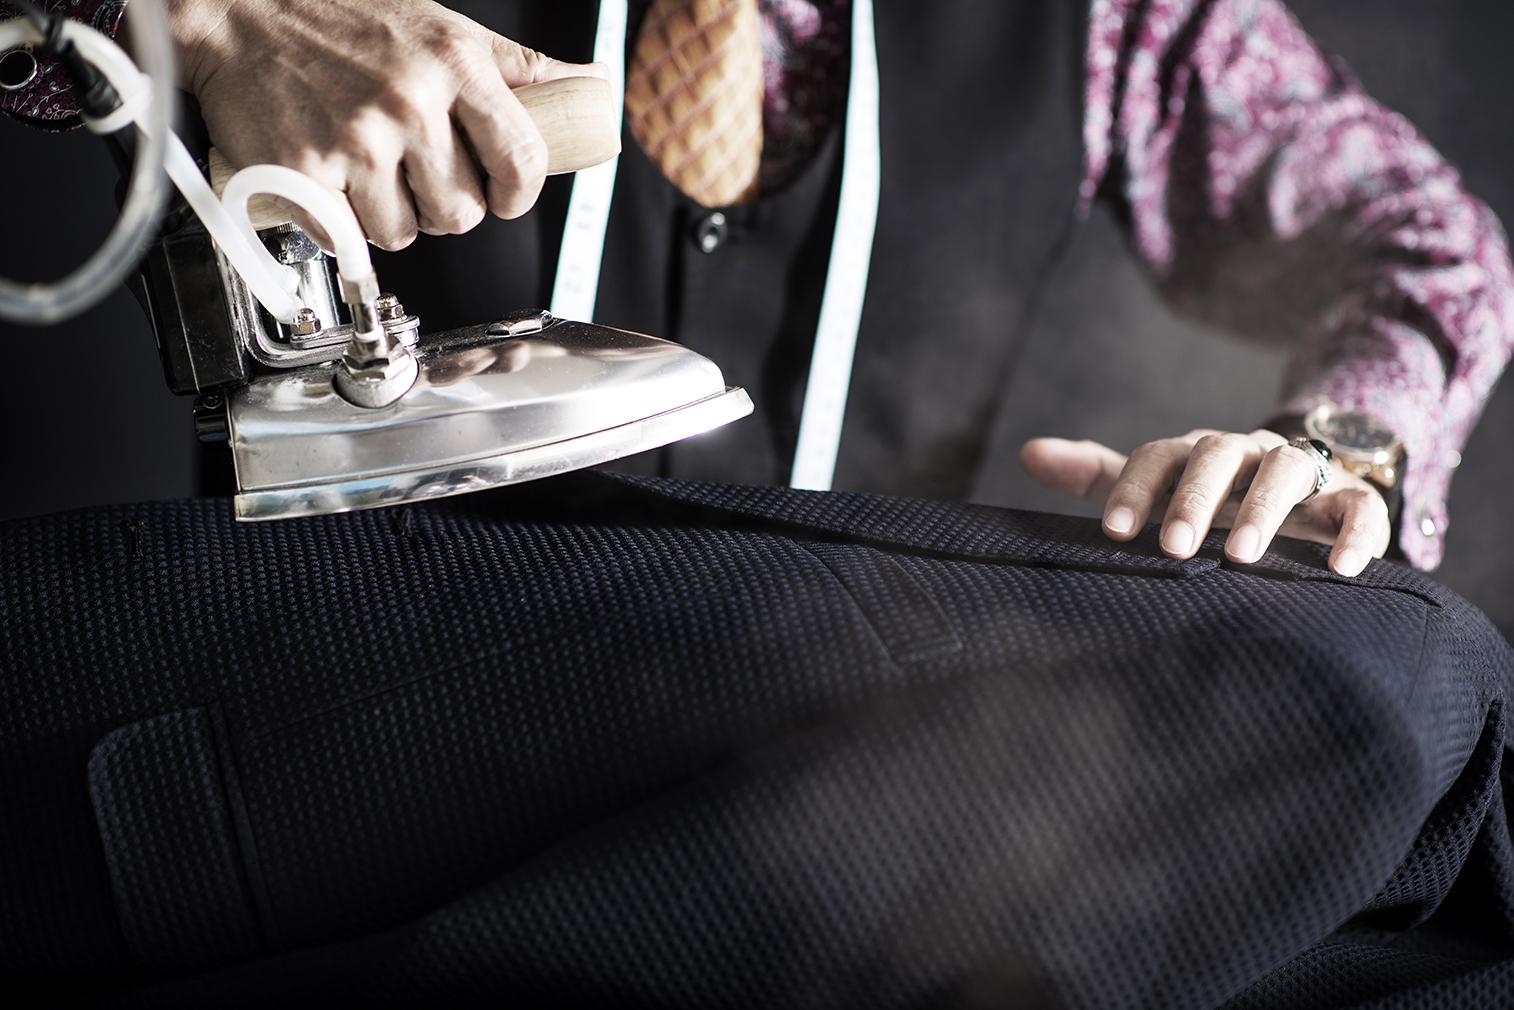 全訂製西服 Bespoke suit tailoring - 金興西服 GOLDEN TAILOR